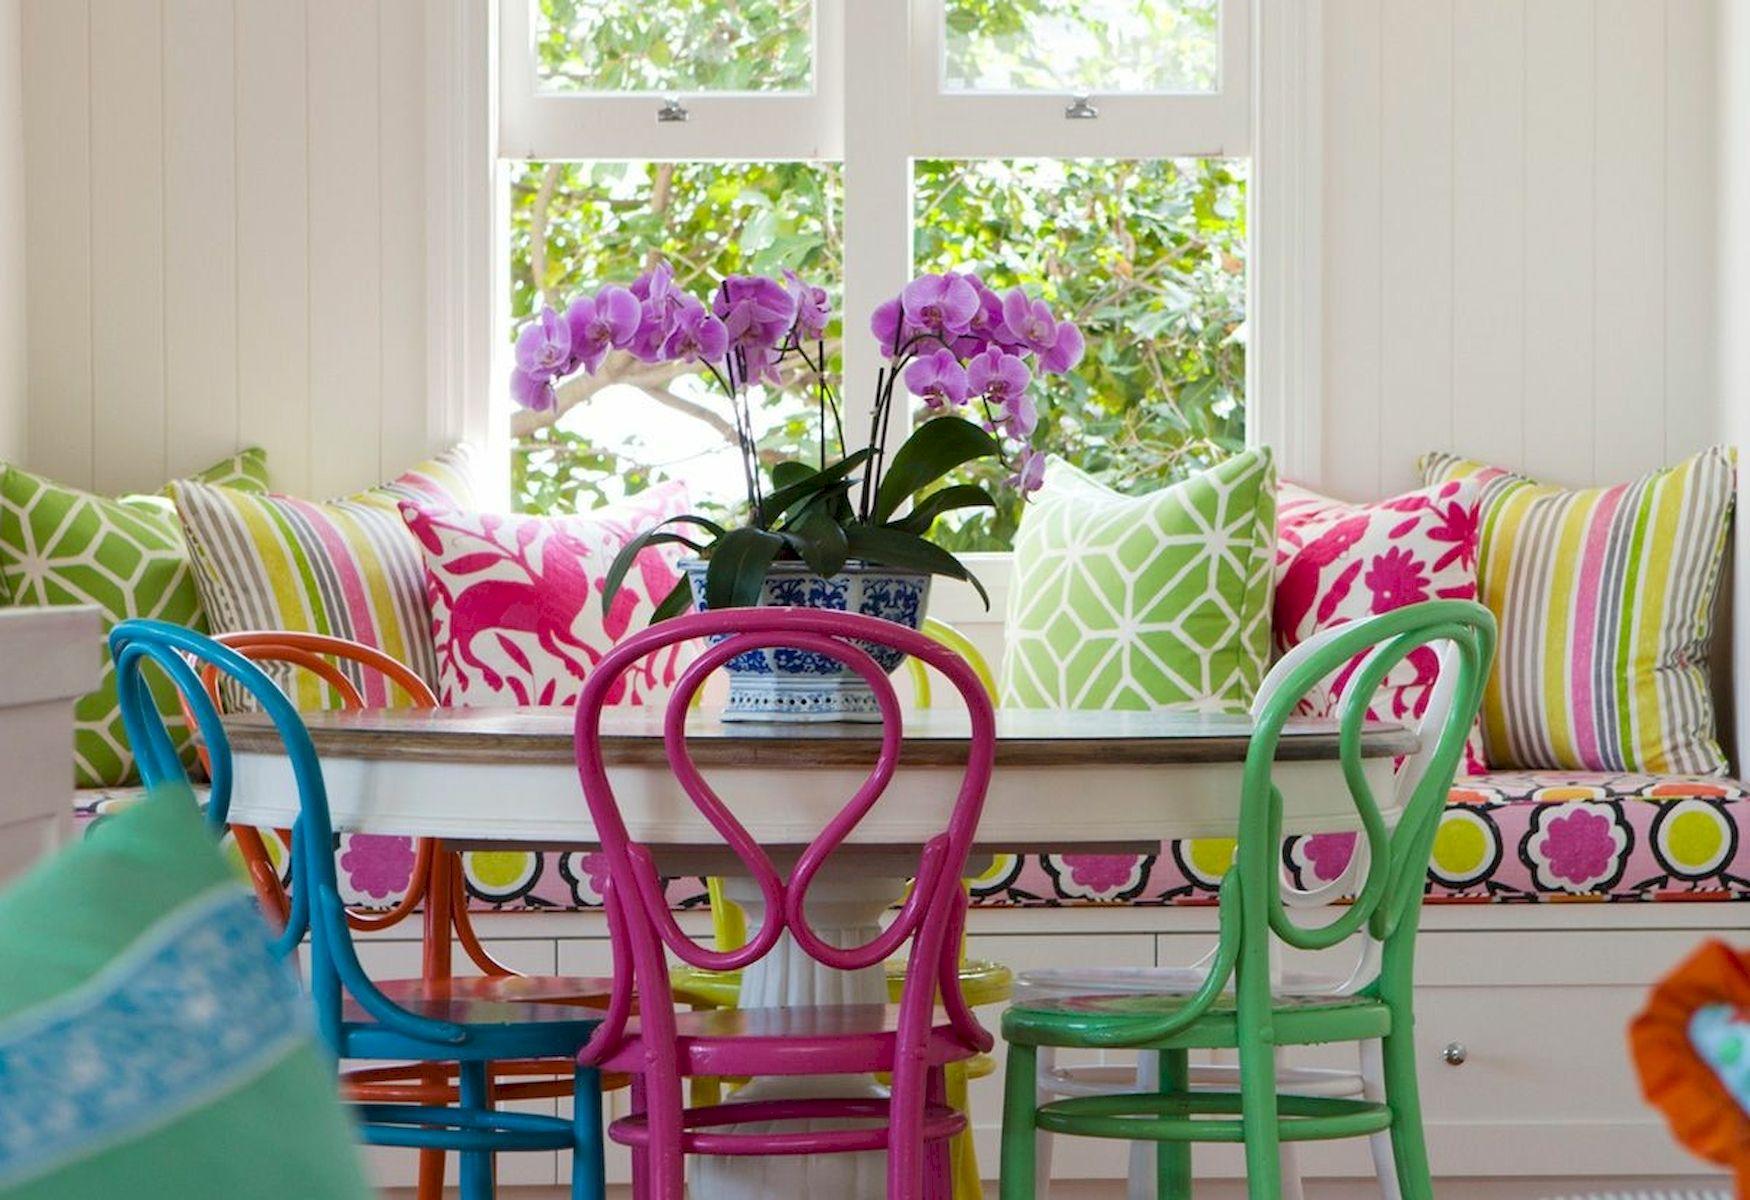 45 Colorful Interior Home Design and Decor Ideas (20)